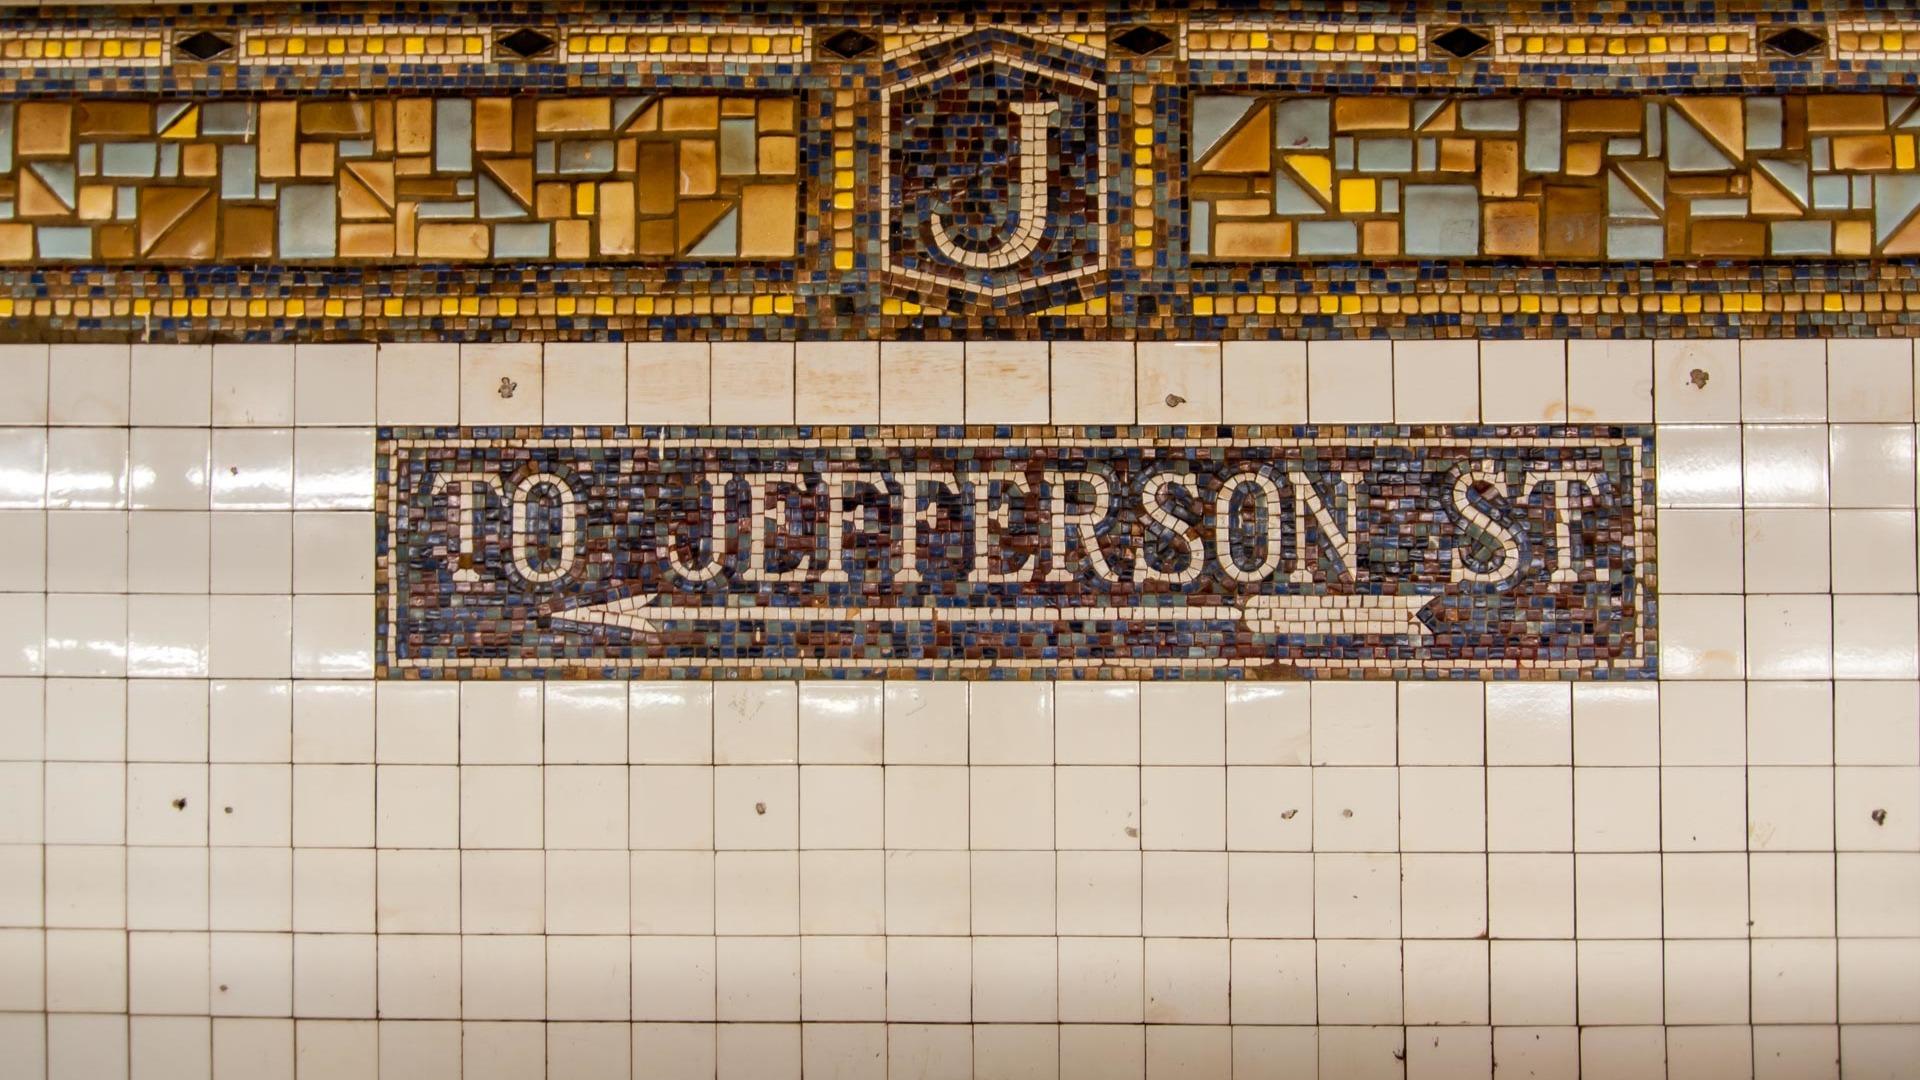 Jefferson street l station 28